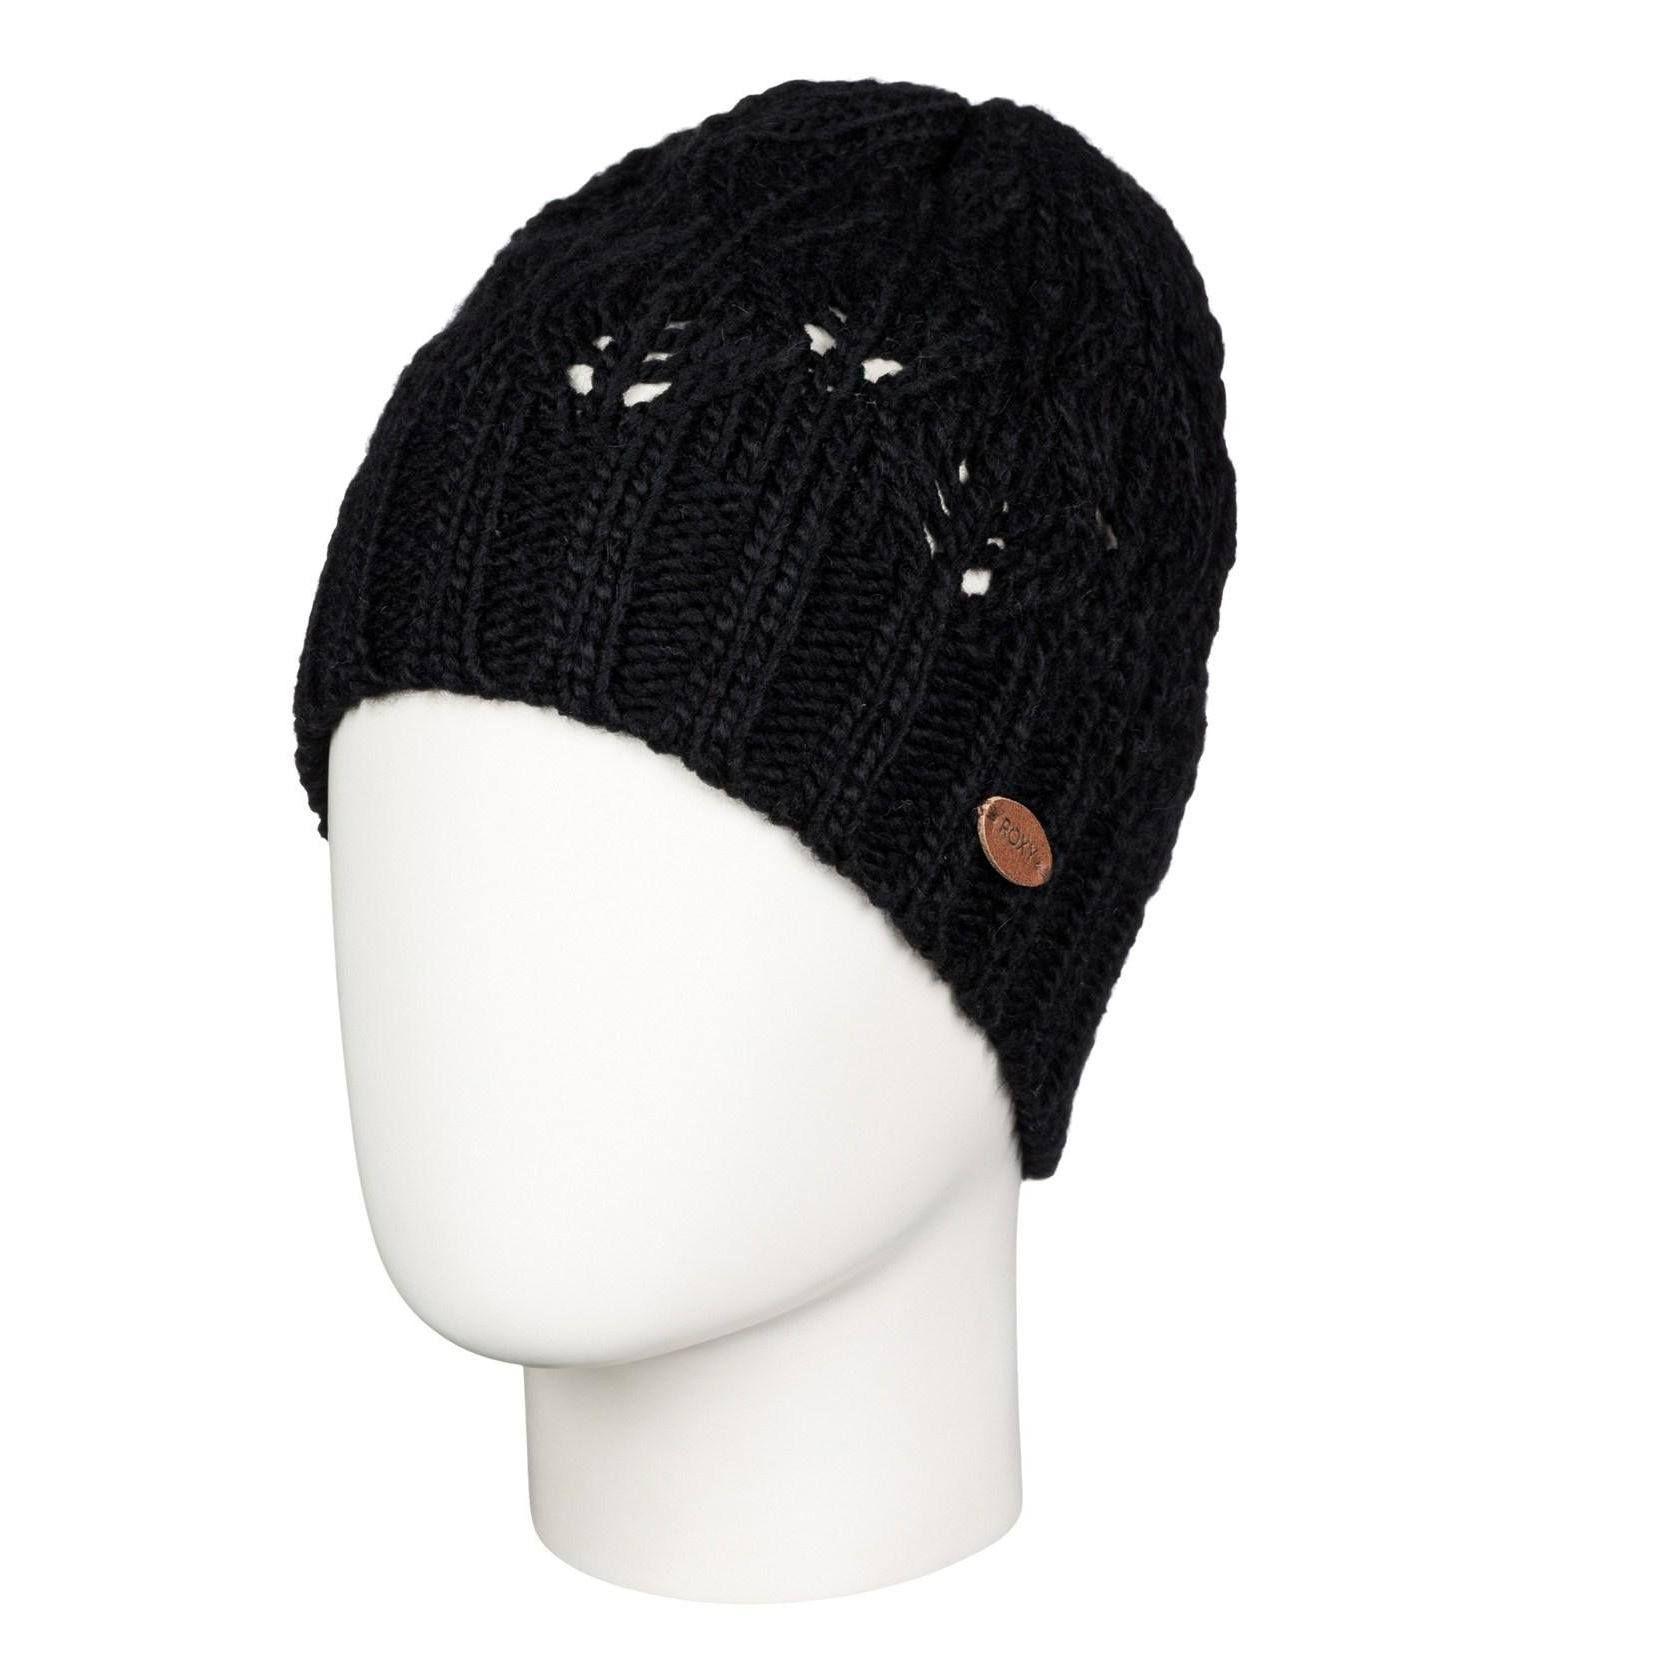 WINTER BEANIE - ACCESSORIES - Hats Roxy Vdq5yN9Rmg